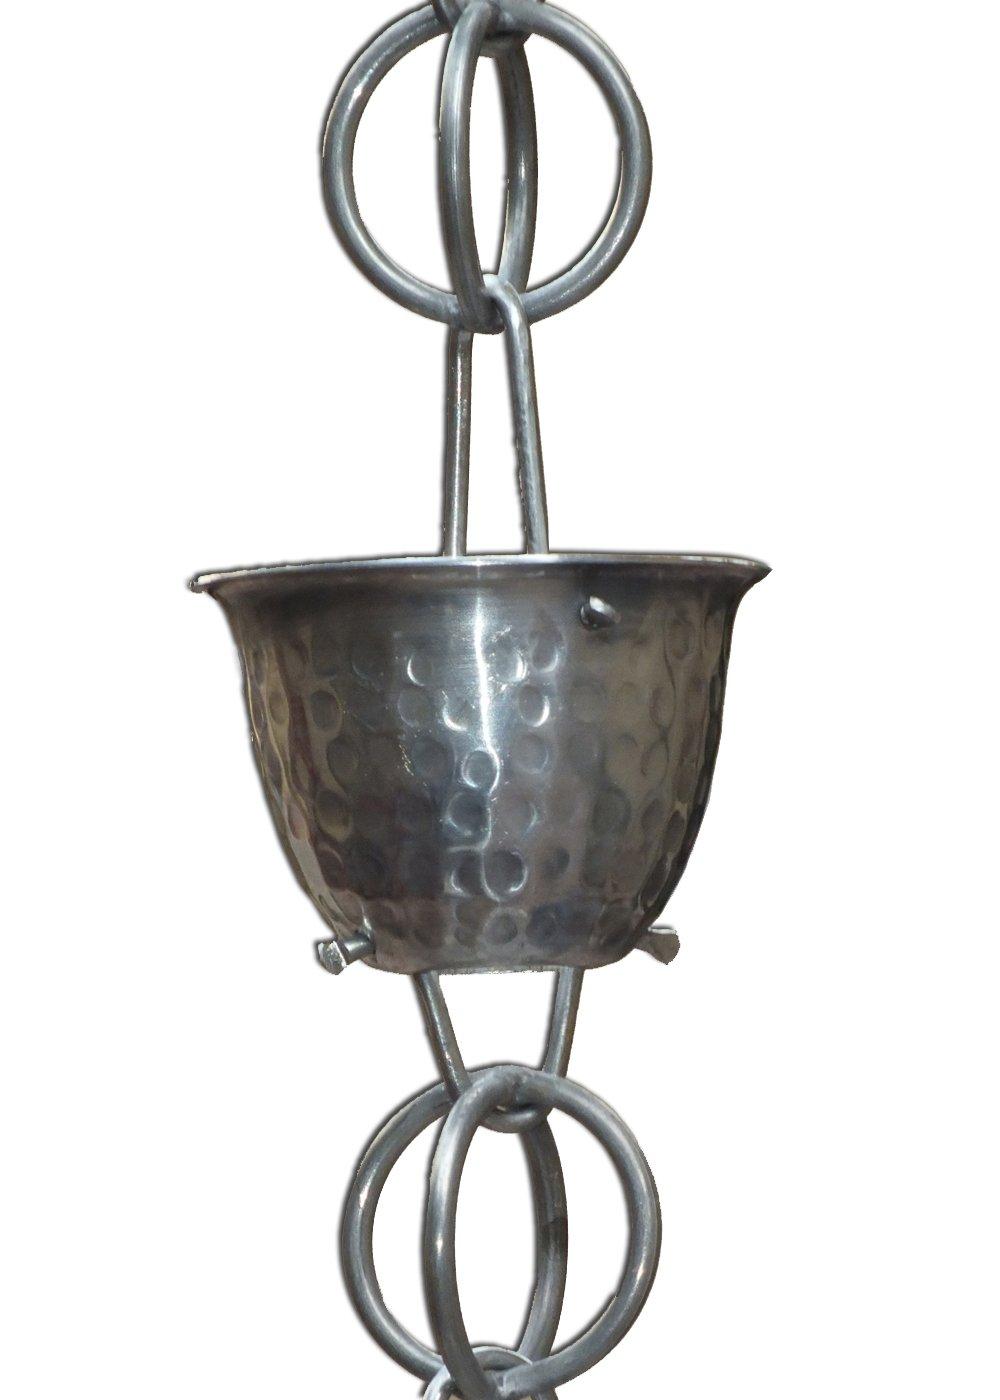 8-1/2-Feet Length Monarch Aluminum Teardrop Rain Chain with Aluminum Gutter Reducer Outdoor Décor Patio, Lawn & Garden